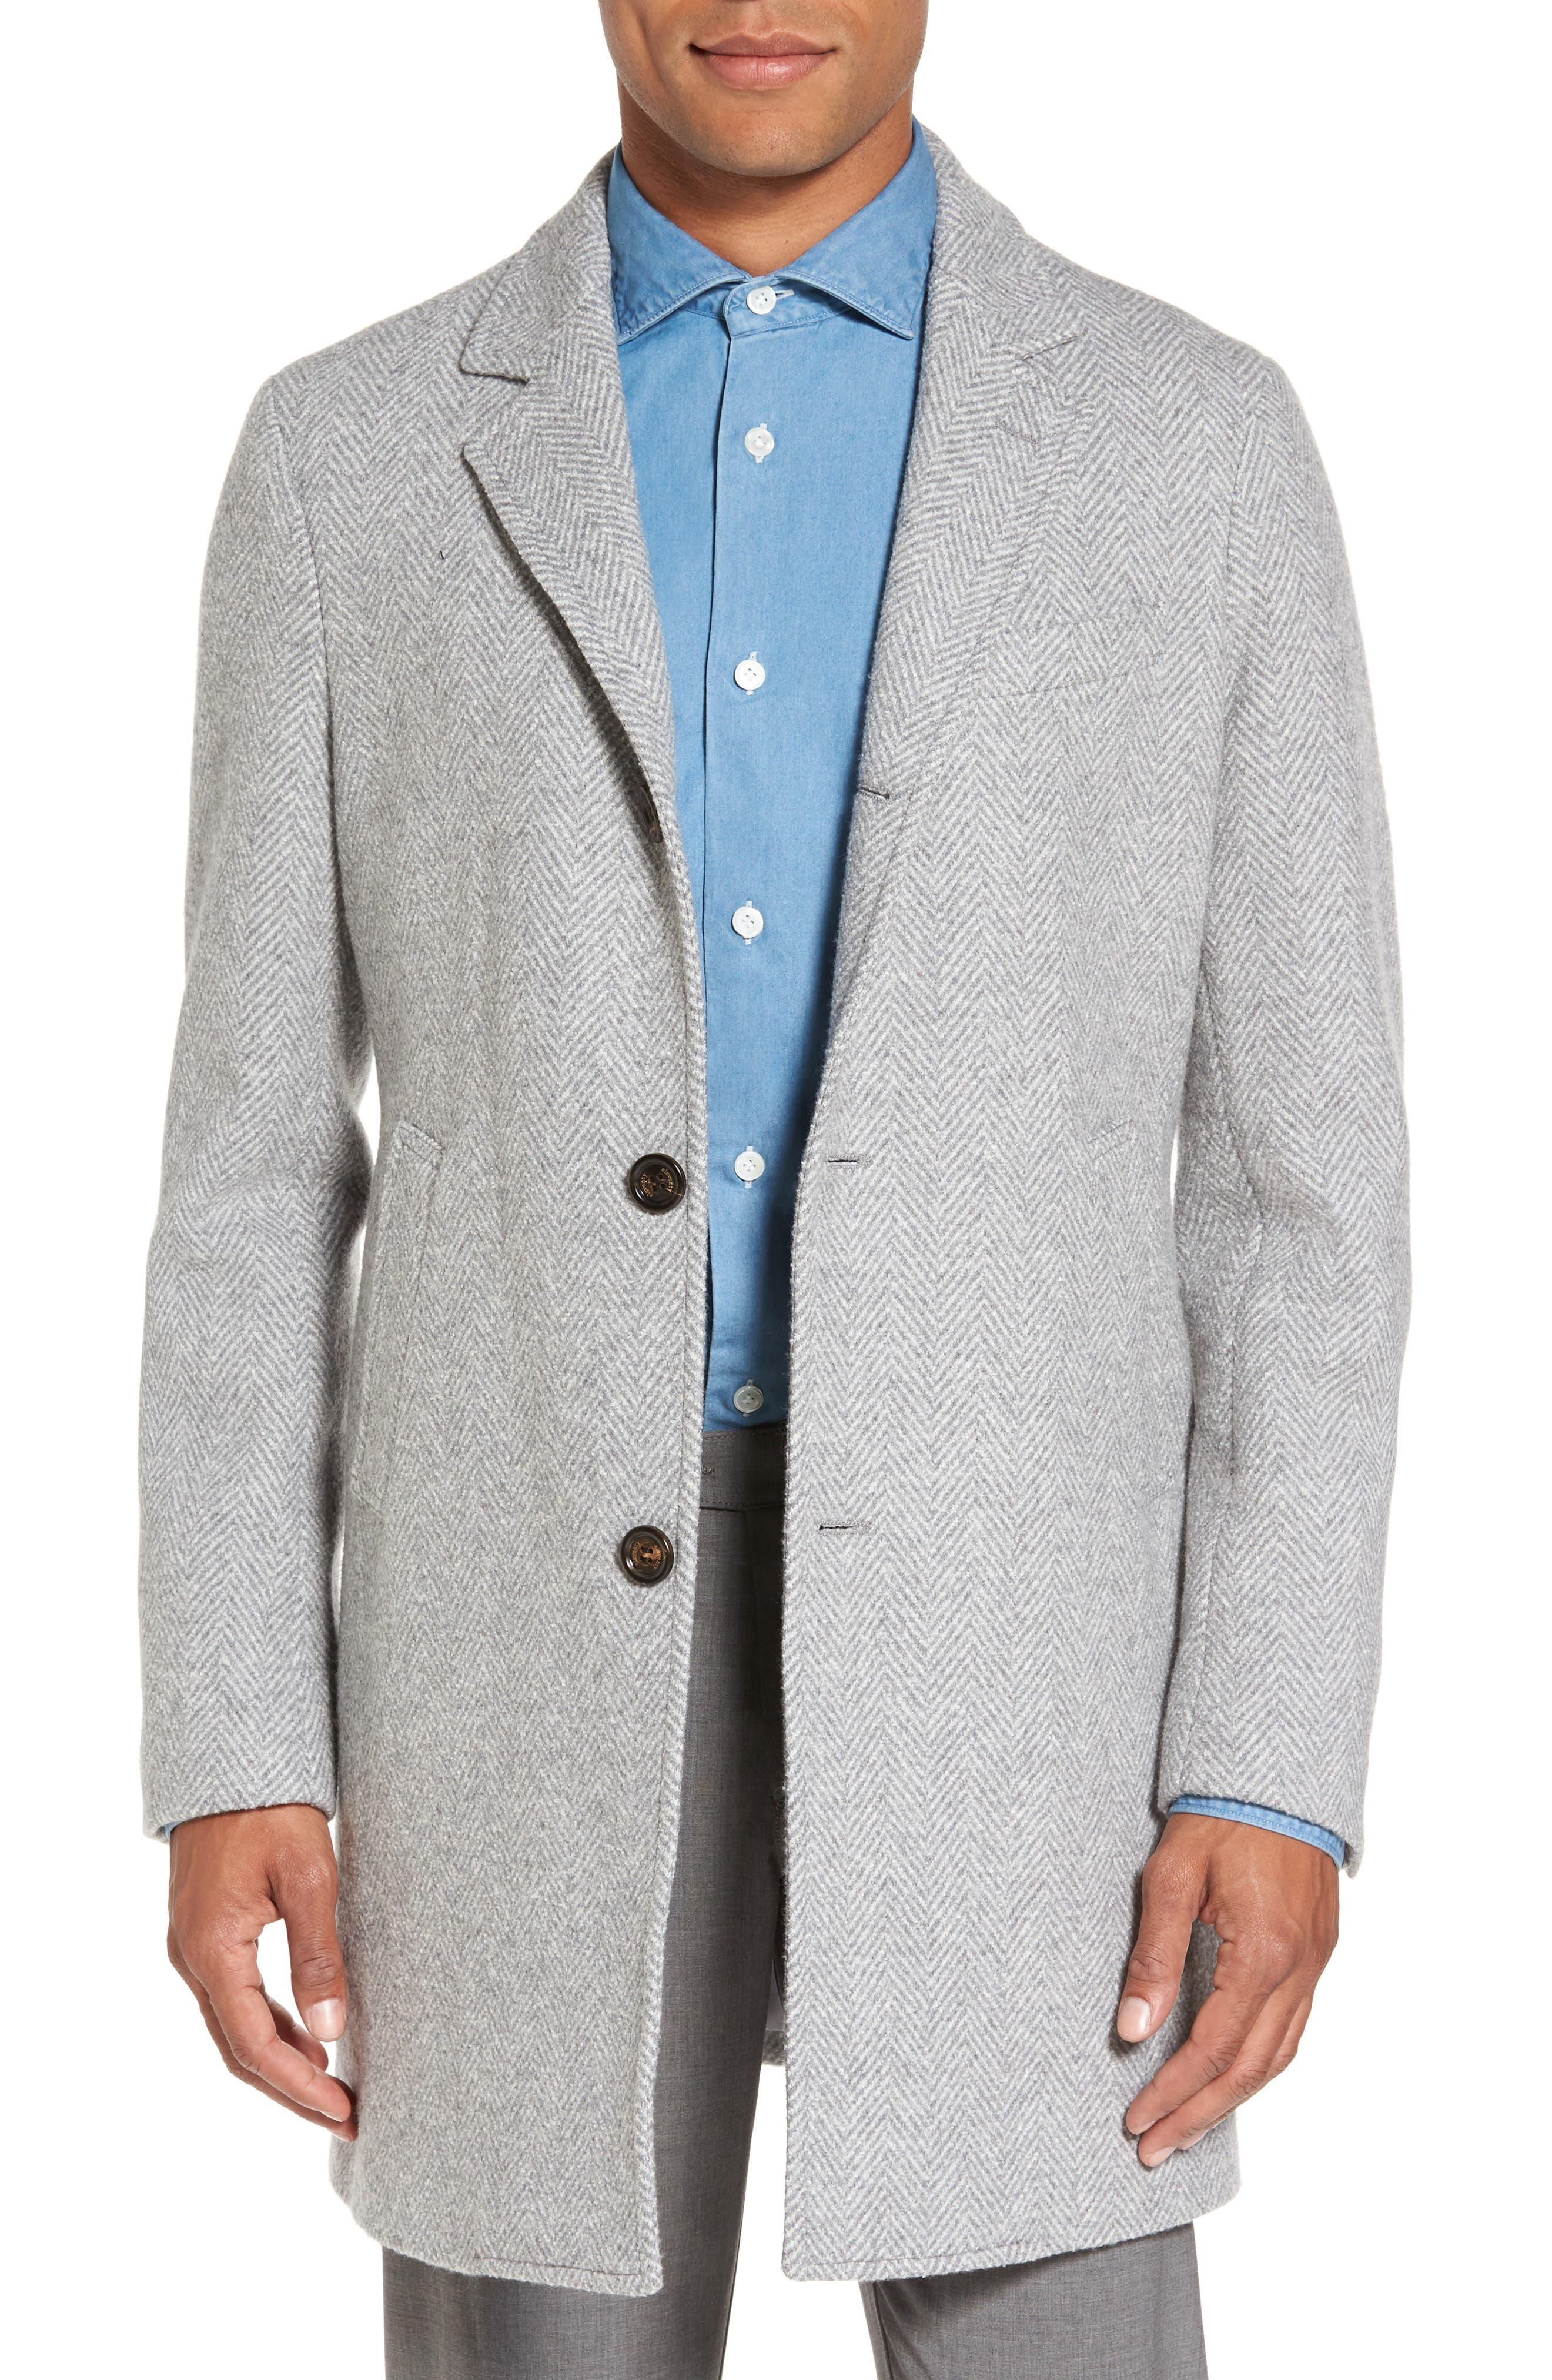 Alternate Image 1 Selected - Eleventy Herringbone Wool Blend Overcoat